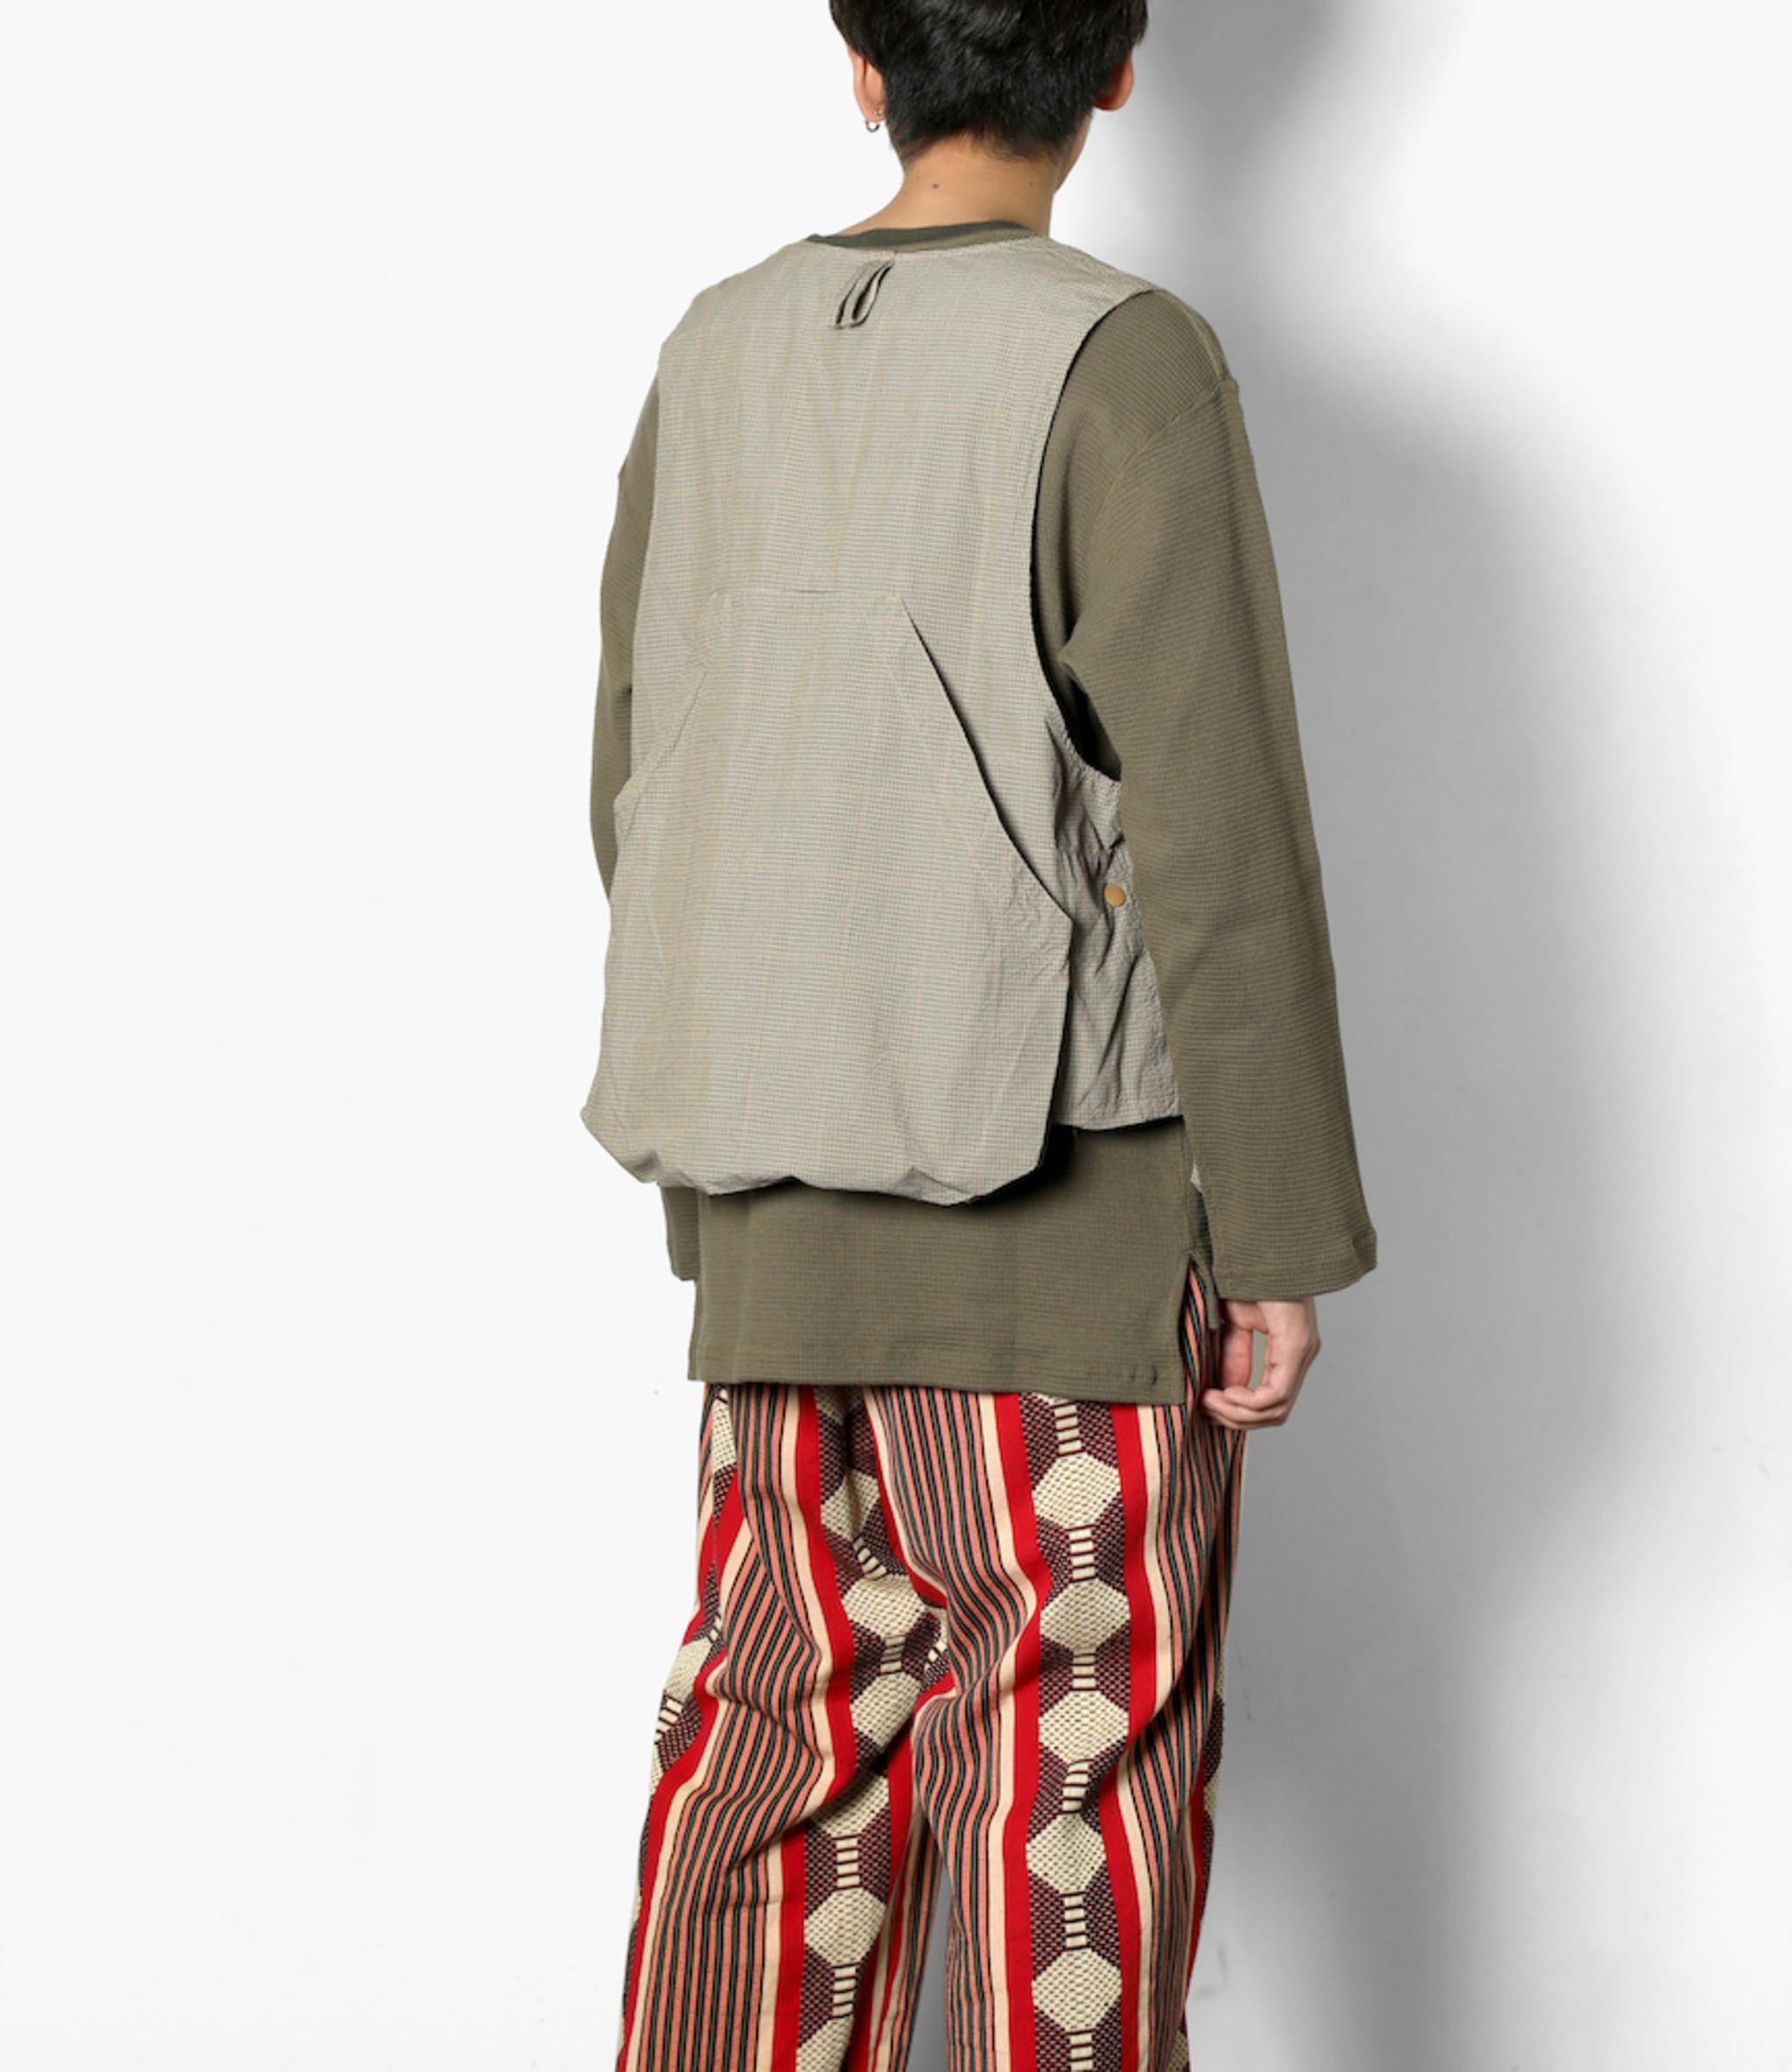 Engineered Garments Game Vest - Khaki Nyco Mini Tattersall